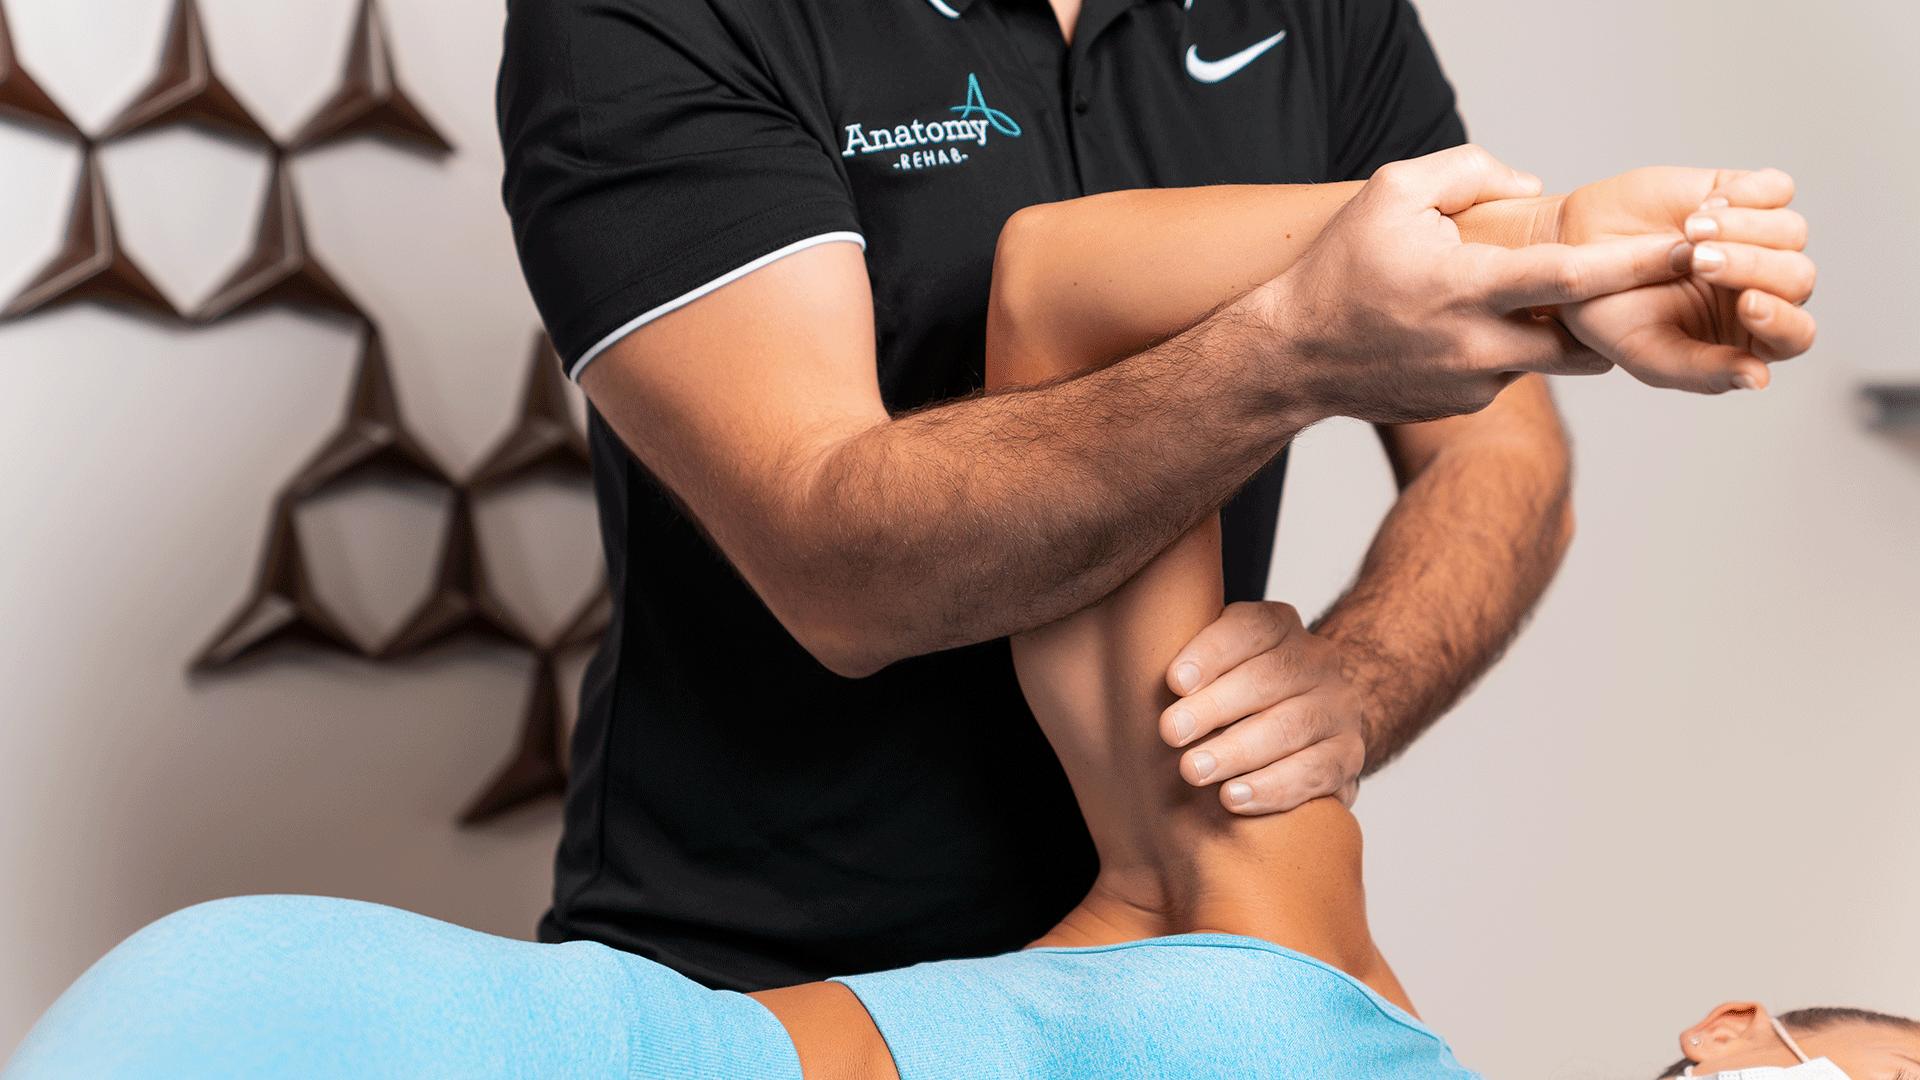 Physiotherapy at Anatomy Rehab